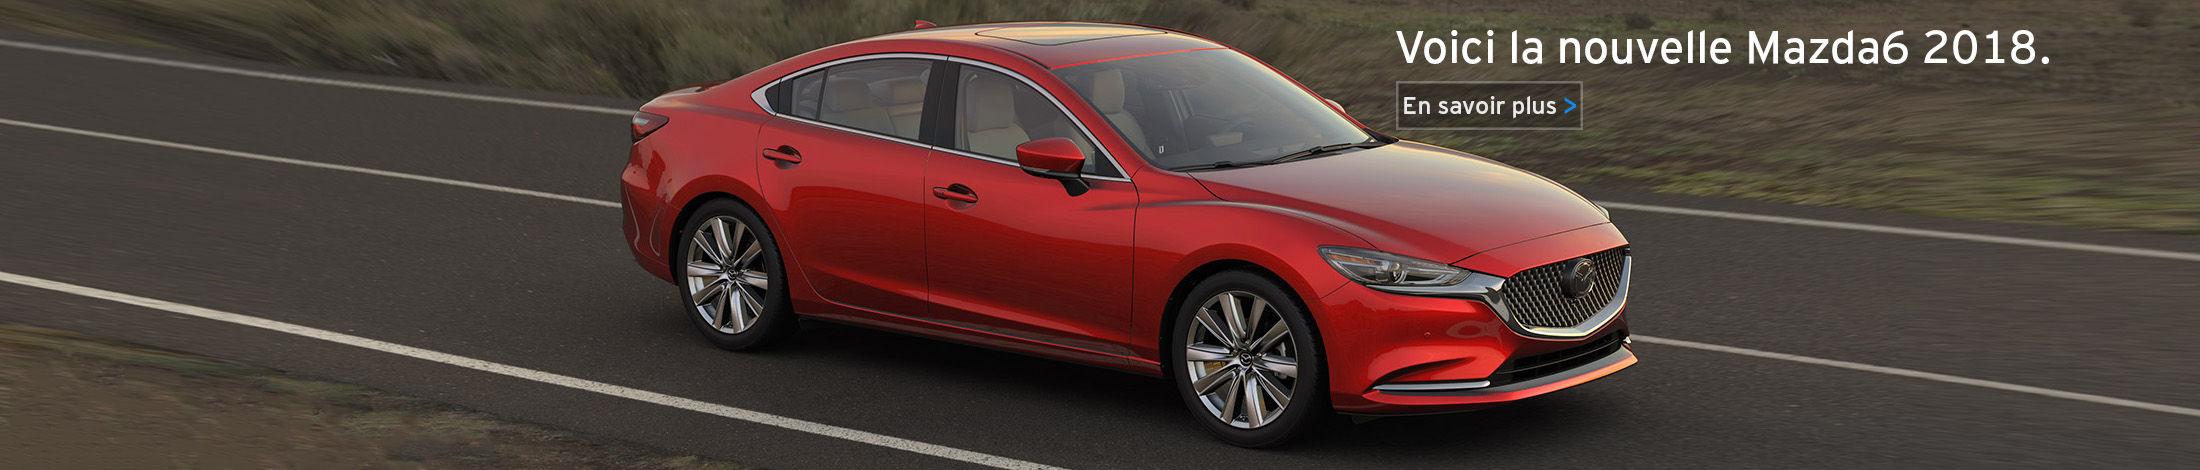 Mazda6 2018 betty